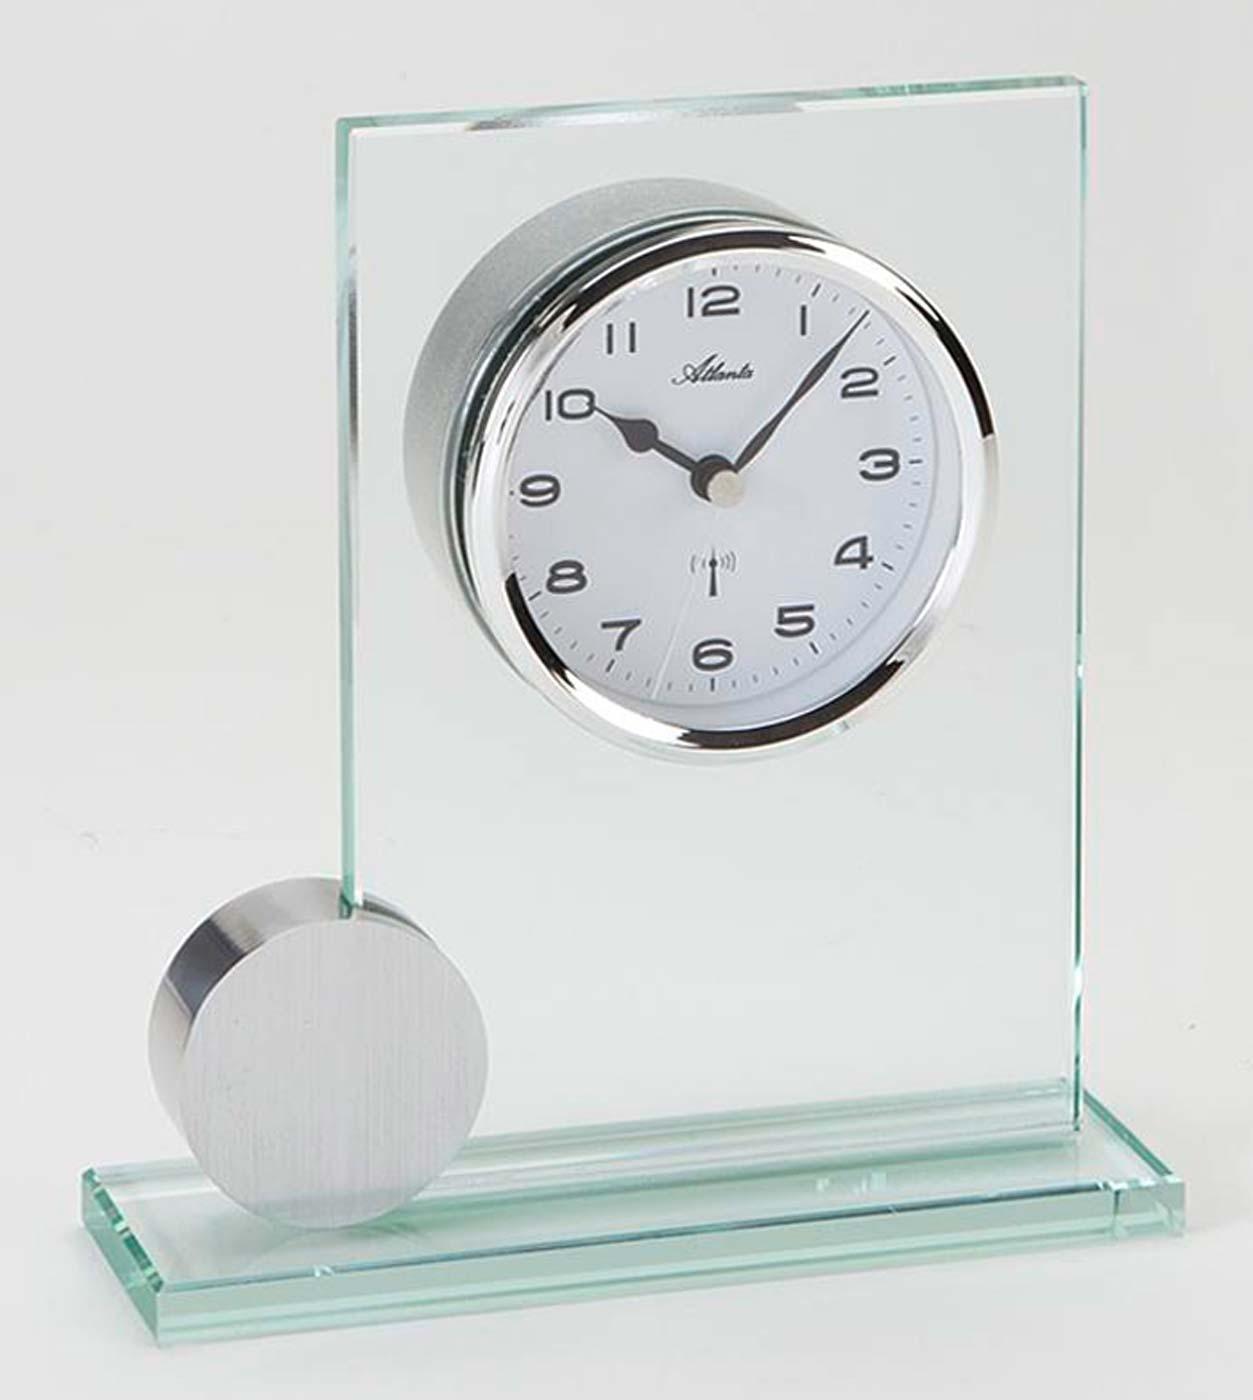 watches chrono12 atlanta 3094 tischuhr modern. Black Bedroom Furniture Sets. Home Design Ideas